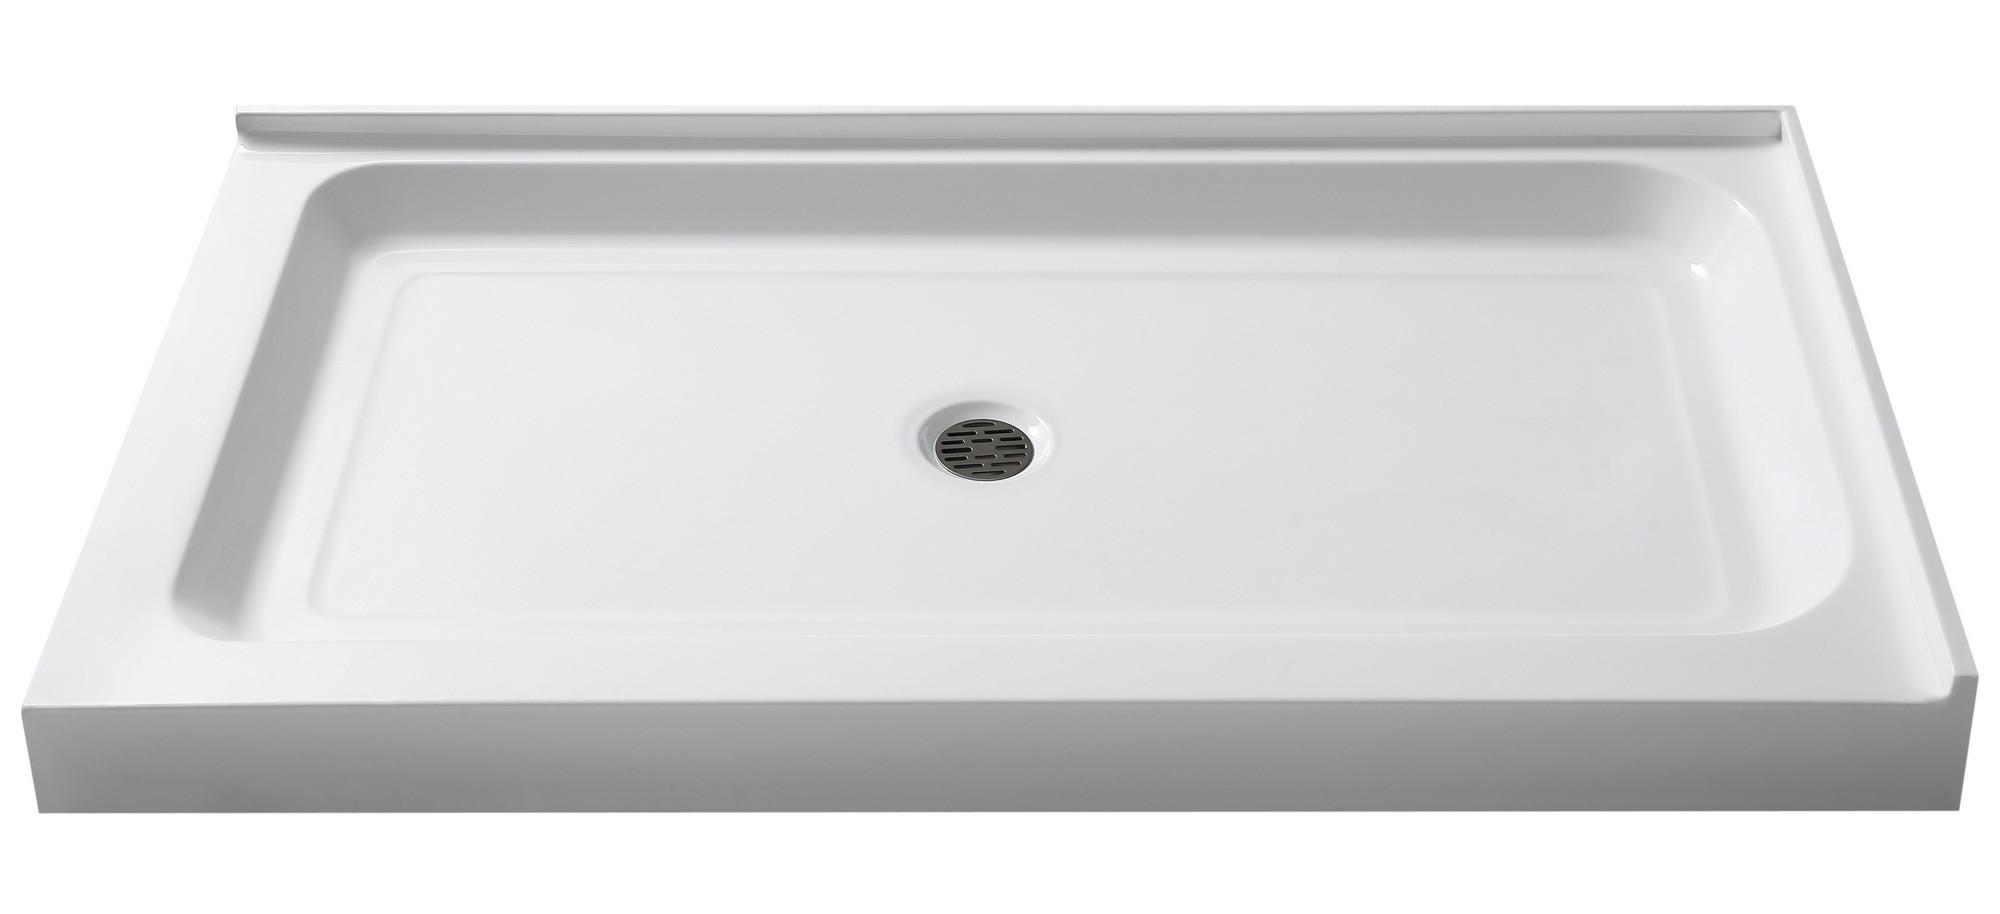 Anzzi SB-AZ022L Port 36 x 48 in. Double Threshold Shower Base in White